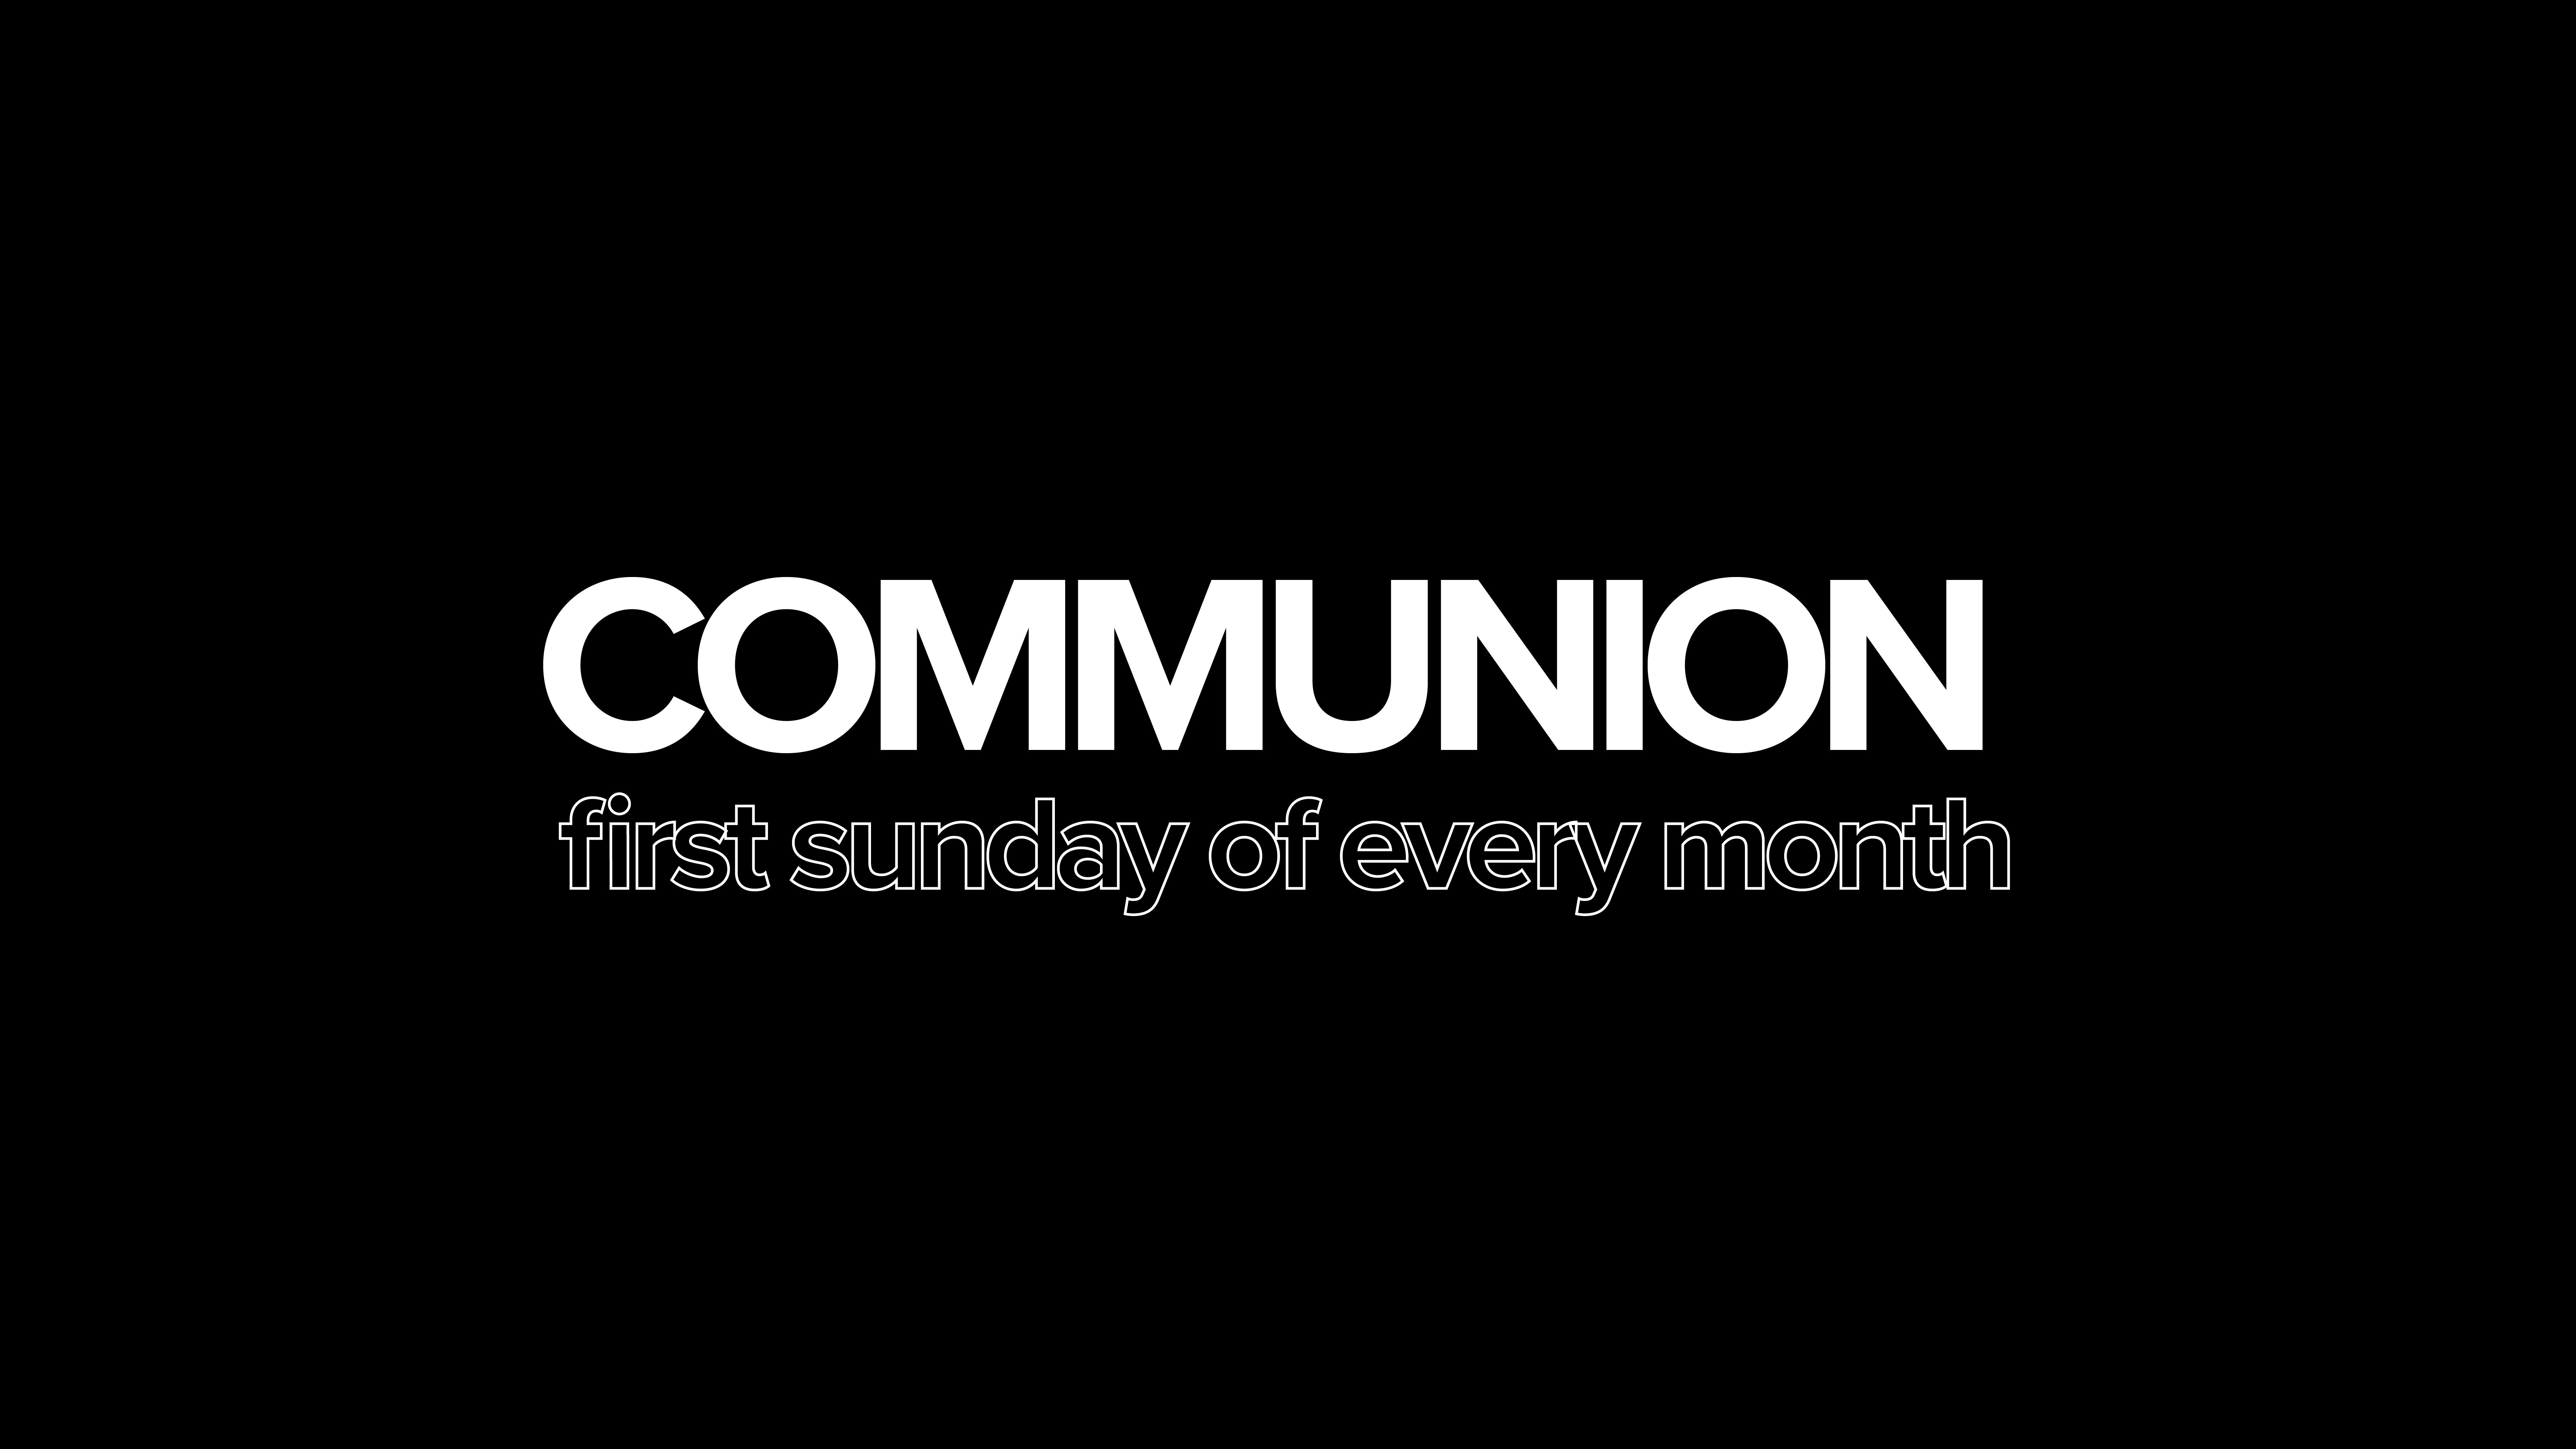 Communion Sunday at the Orange County campus